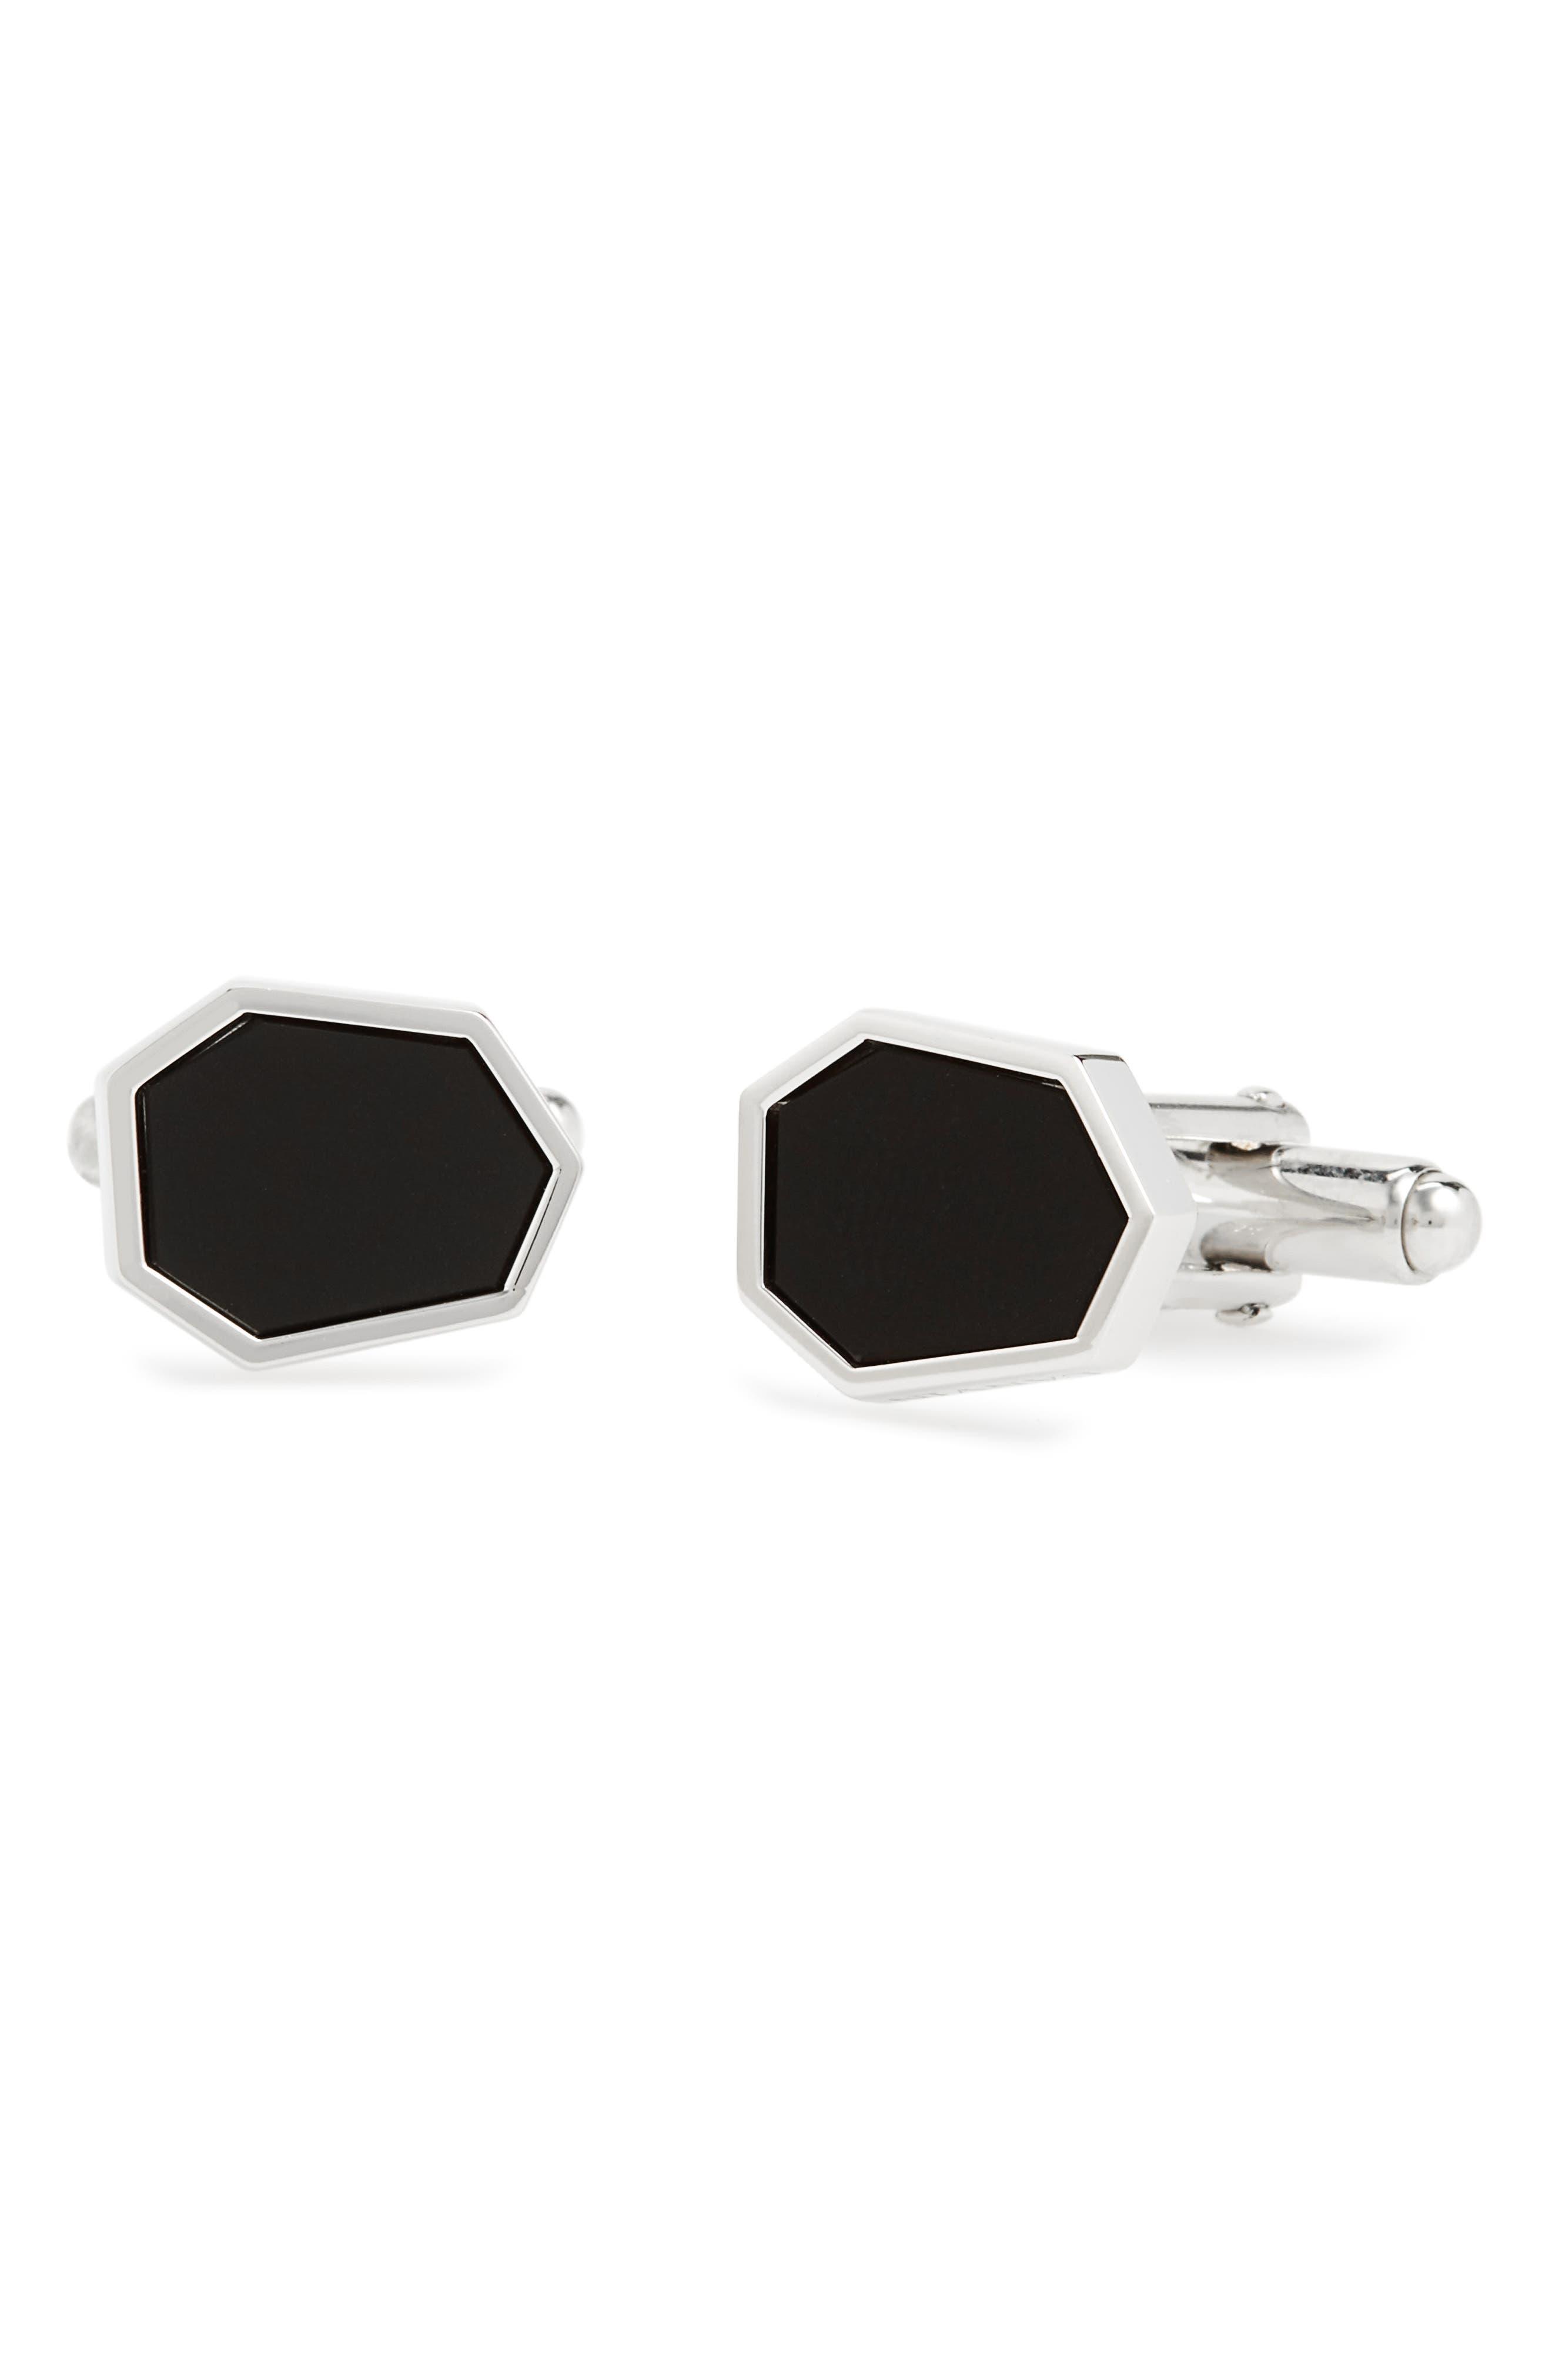 Main Image - Lanvin Polygon Onyx Cuff Links